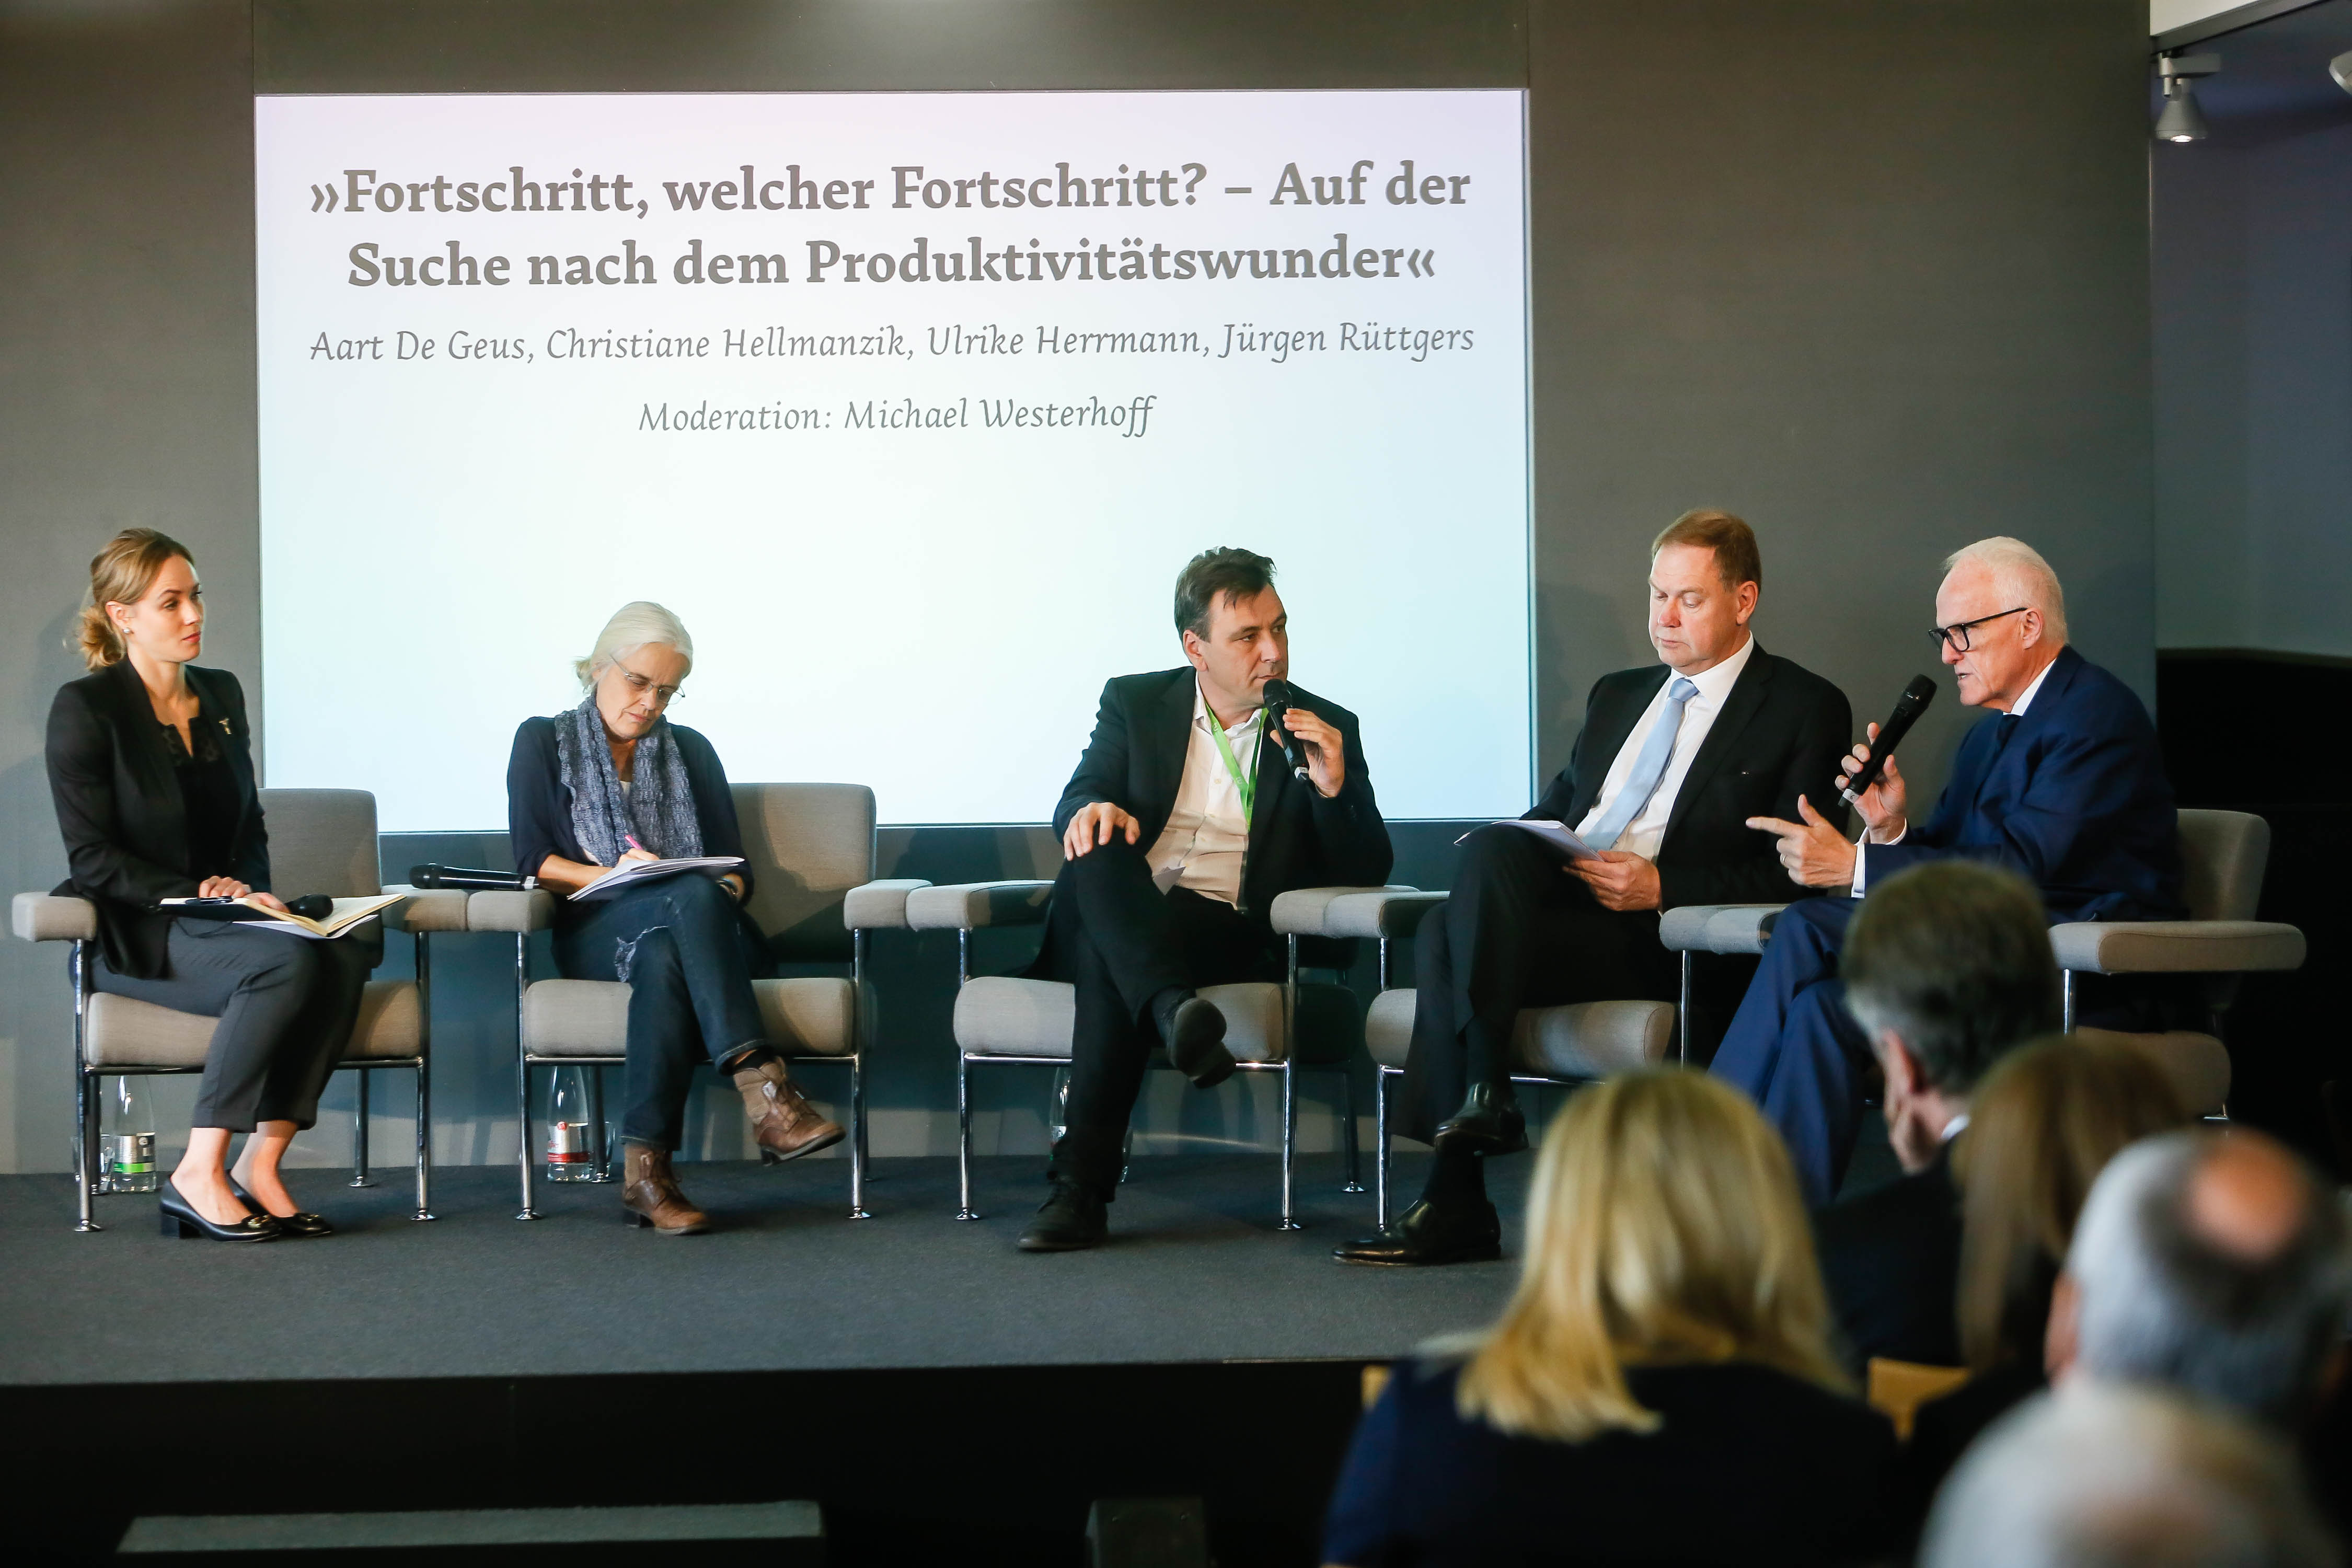 V.l.n.r.: Christiane Hellmanzik, Ulrike Herrmann, Michael Westerhoff, Aart De Geus, Jürgen Rüttgers. Bild: Oliver Schaper